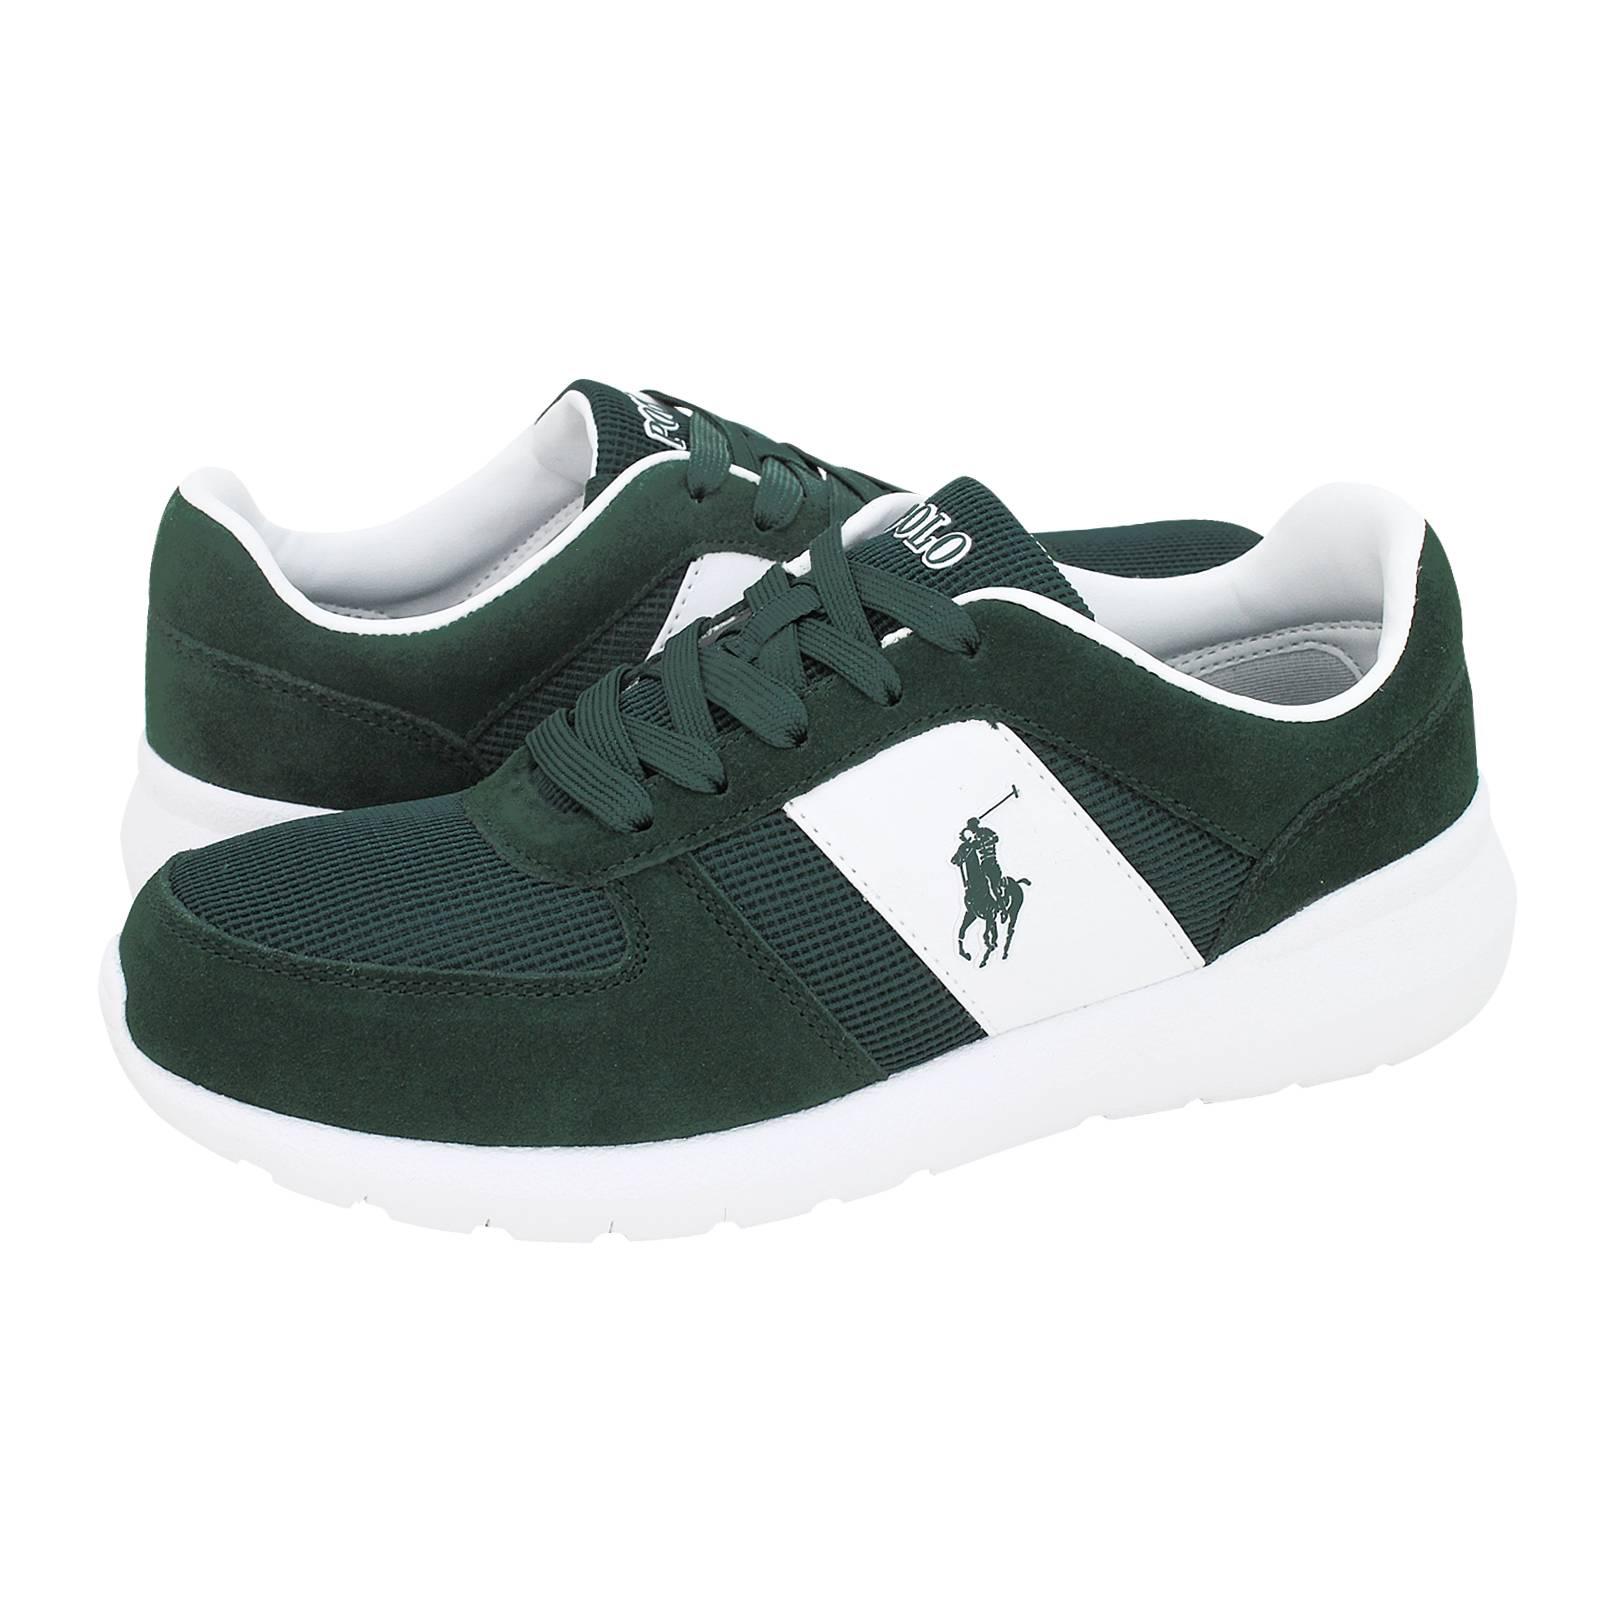 86c117017e Couvet - Ανδρικά παπούτσια casual Polo Ralph Lauren από καστορι ...